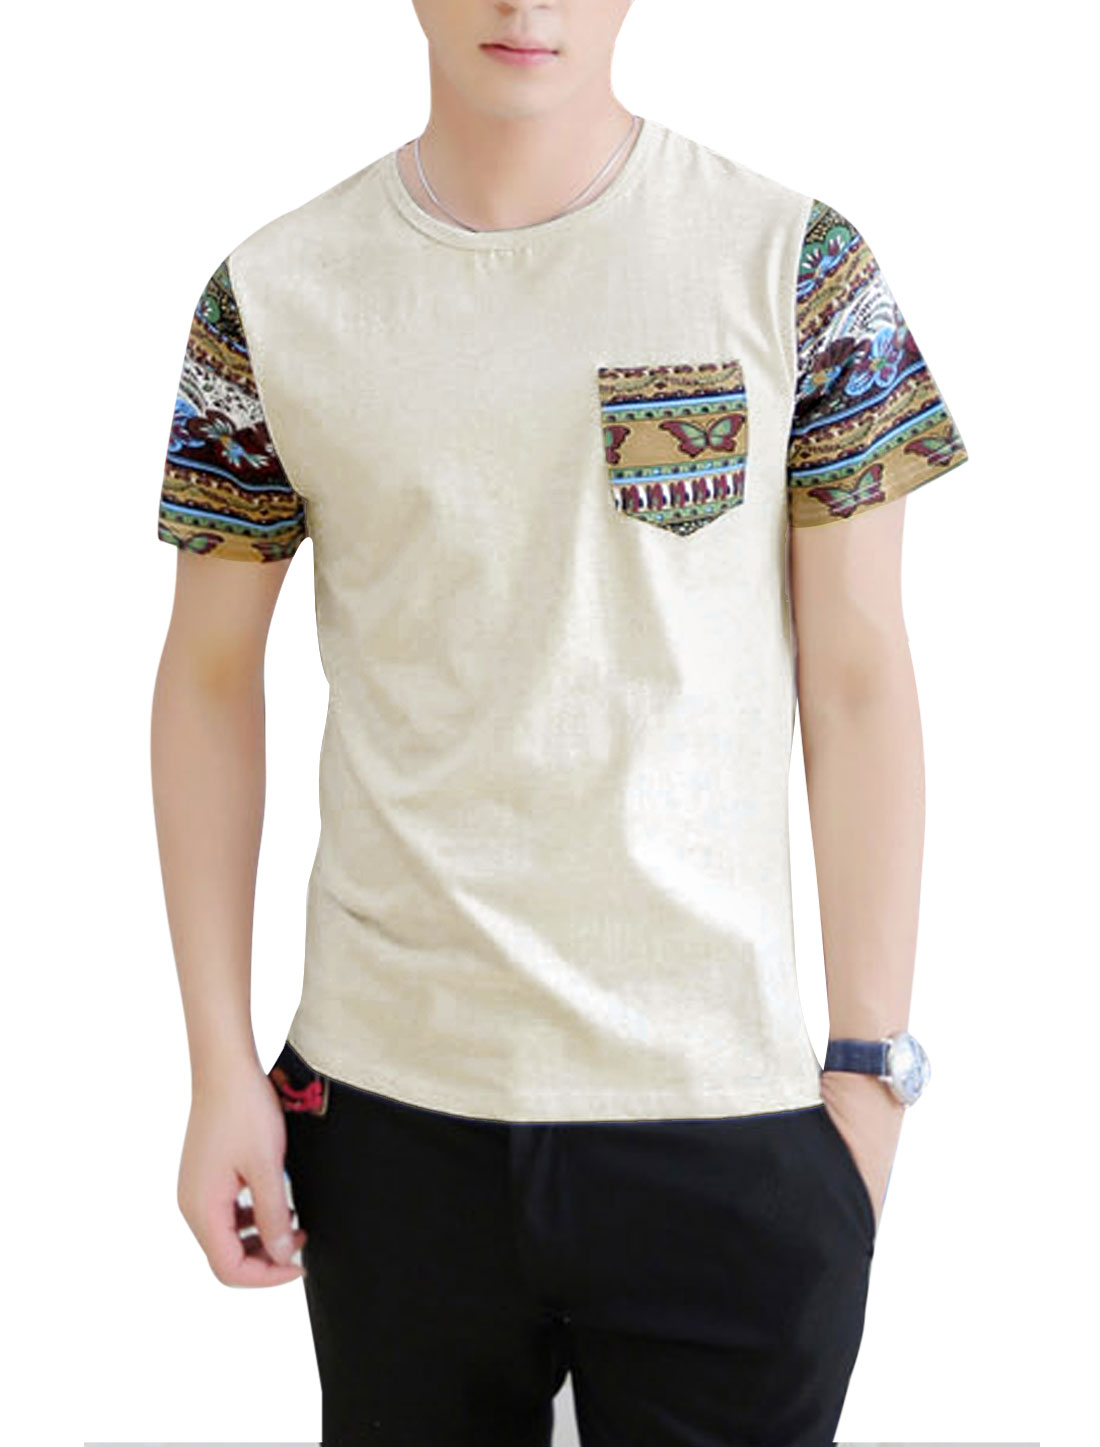 Men Round Neck Short Sleeve Floral Prints Patchwork T-Shirt Light Gray M